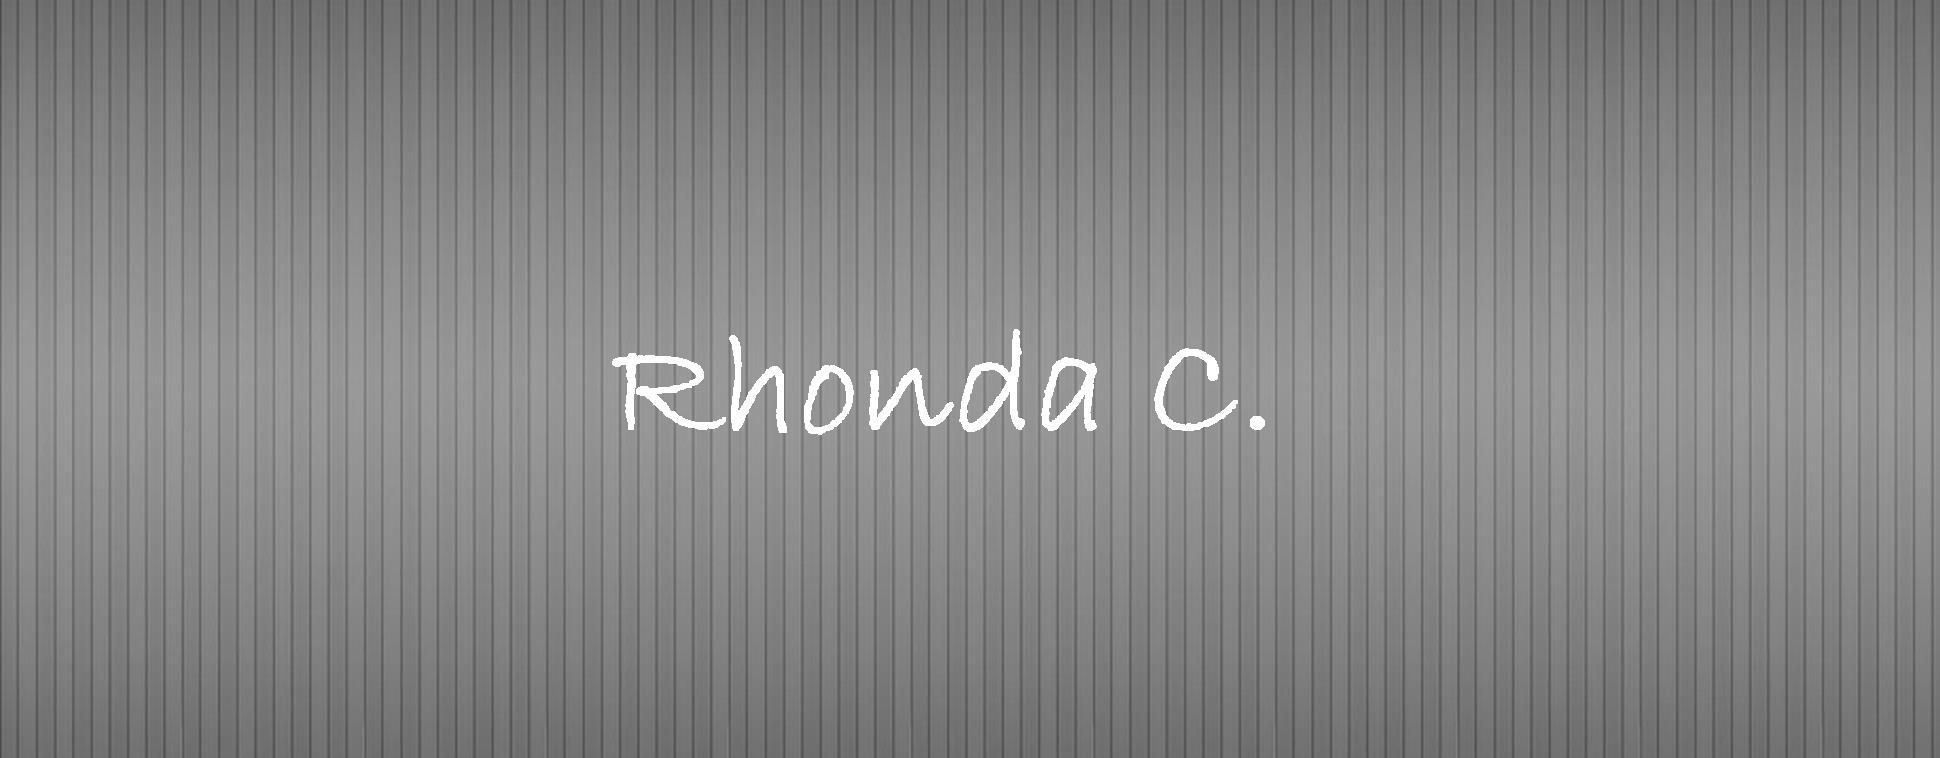 Rhonda Crosson.jpg